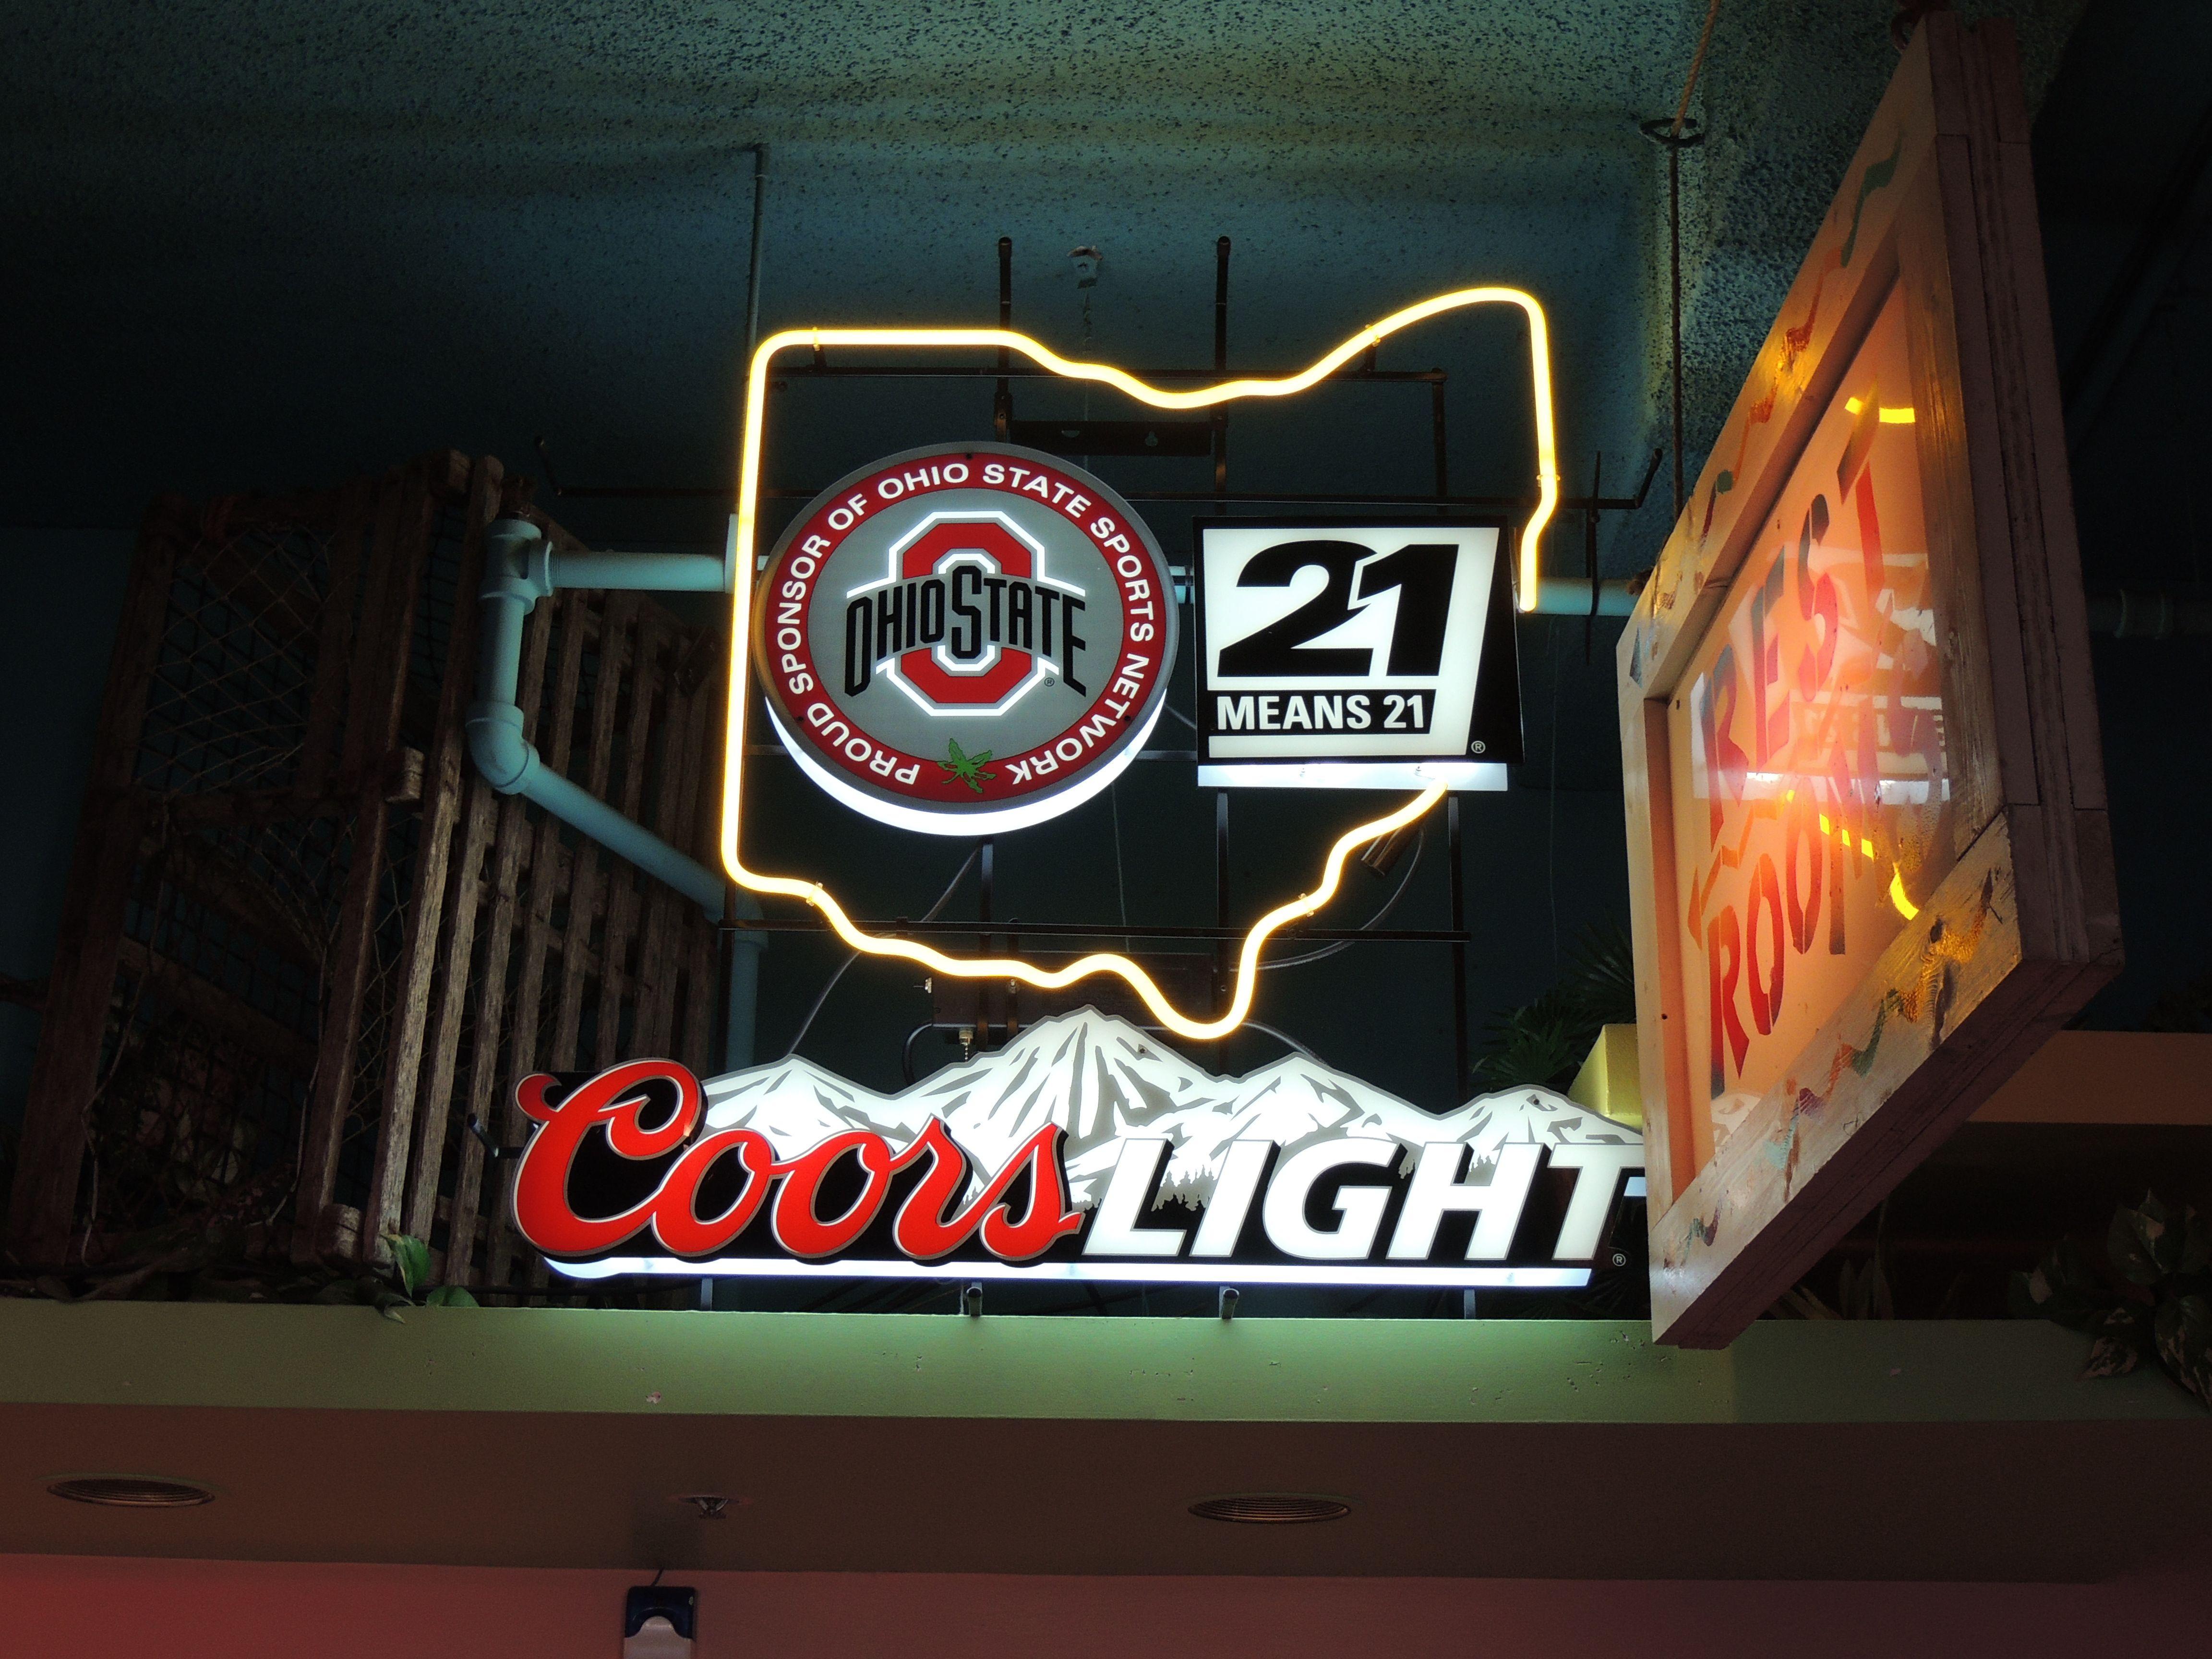 Neon beer sign nfl football nfl helmets coors light neon neon beer sign coors light ohio state university osu aloadofball Choice Image